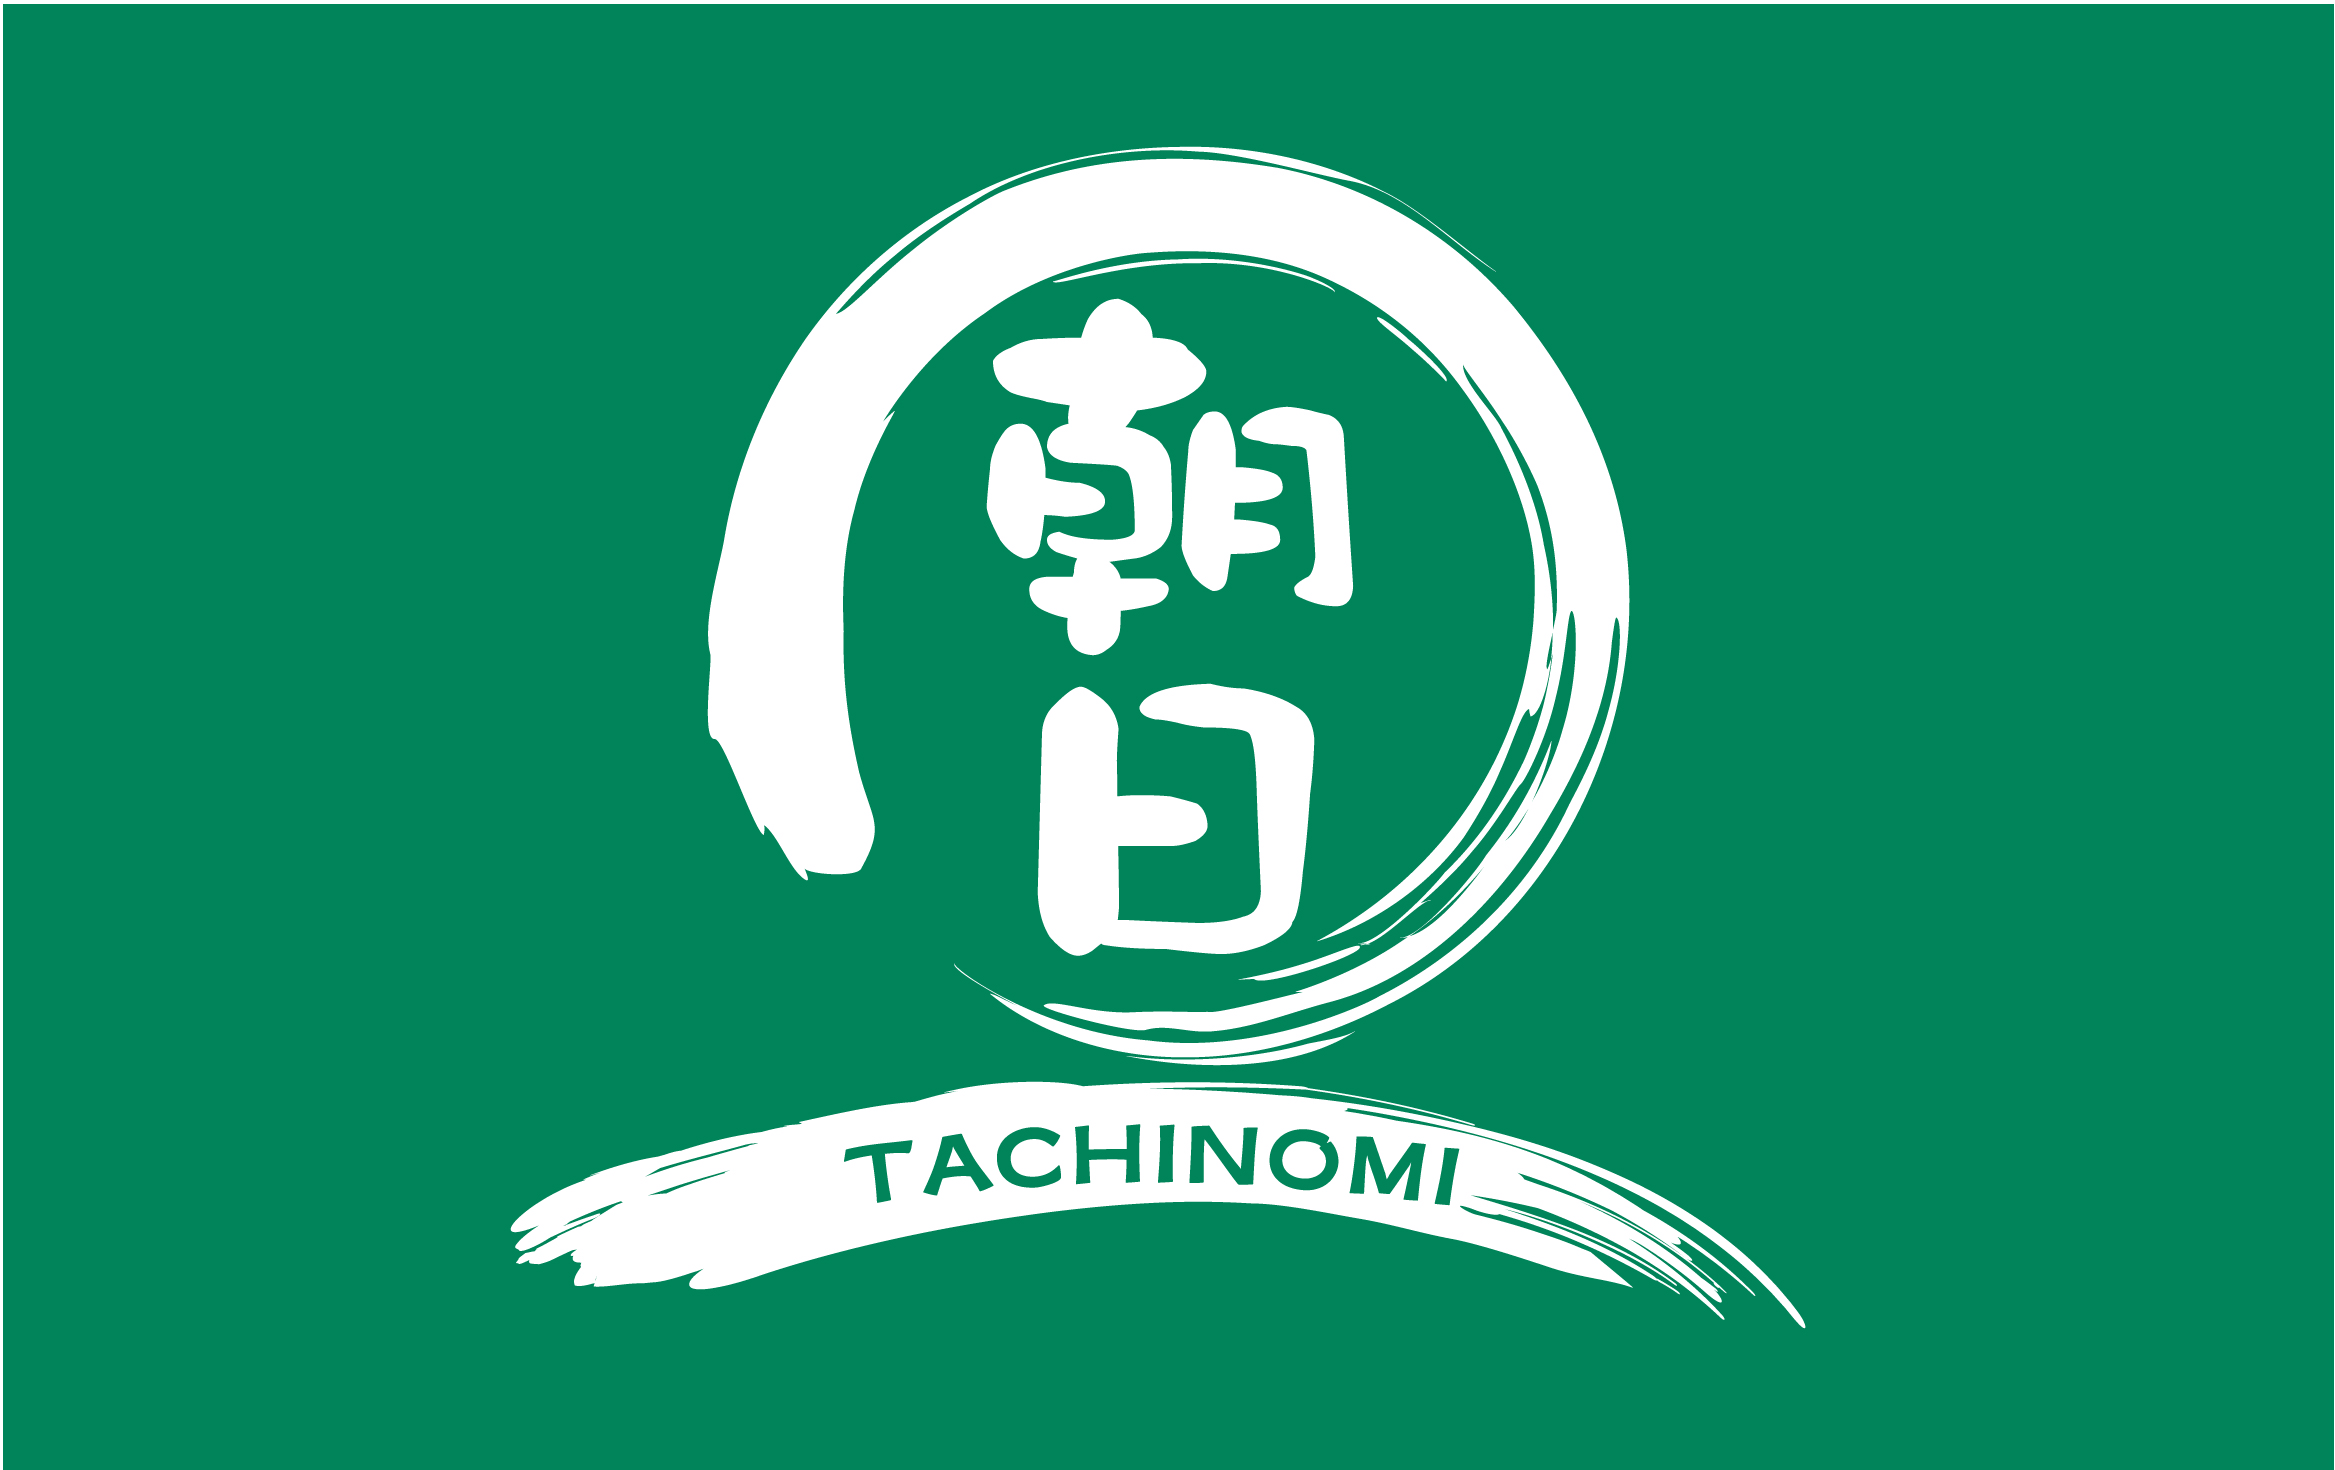 TACHINOMI 朝日様